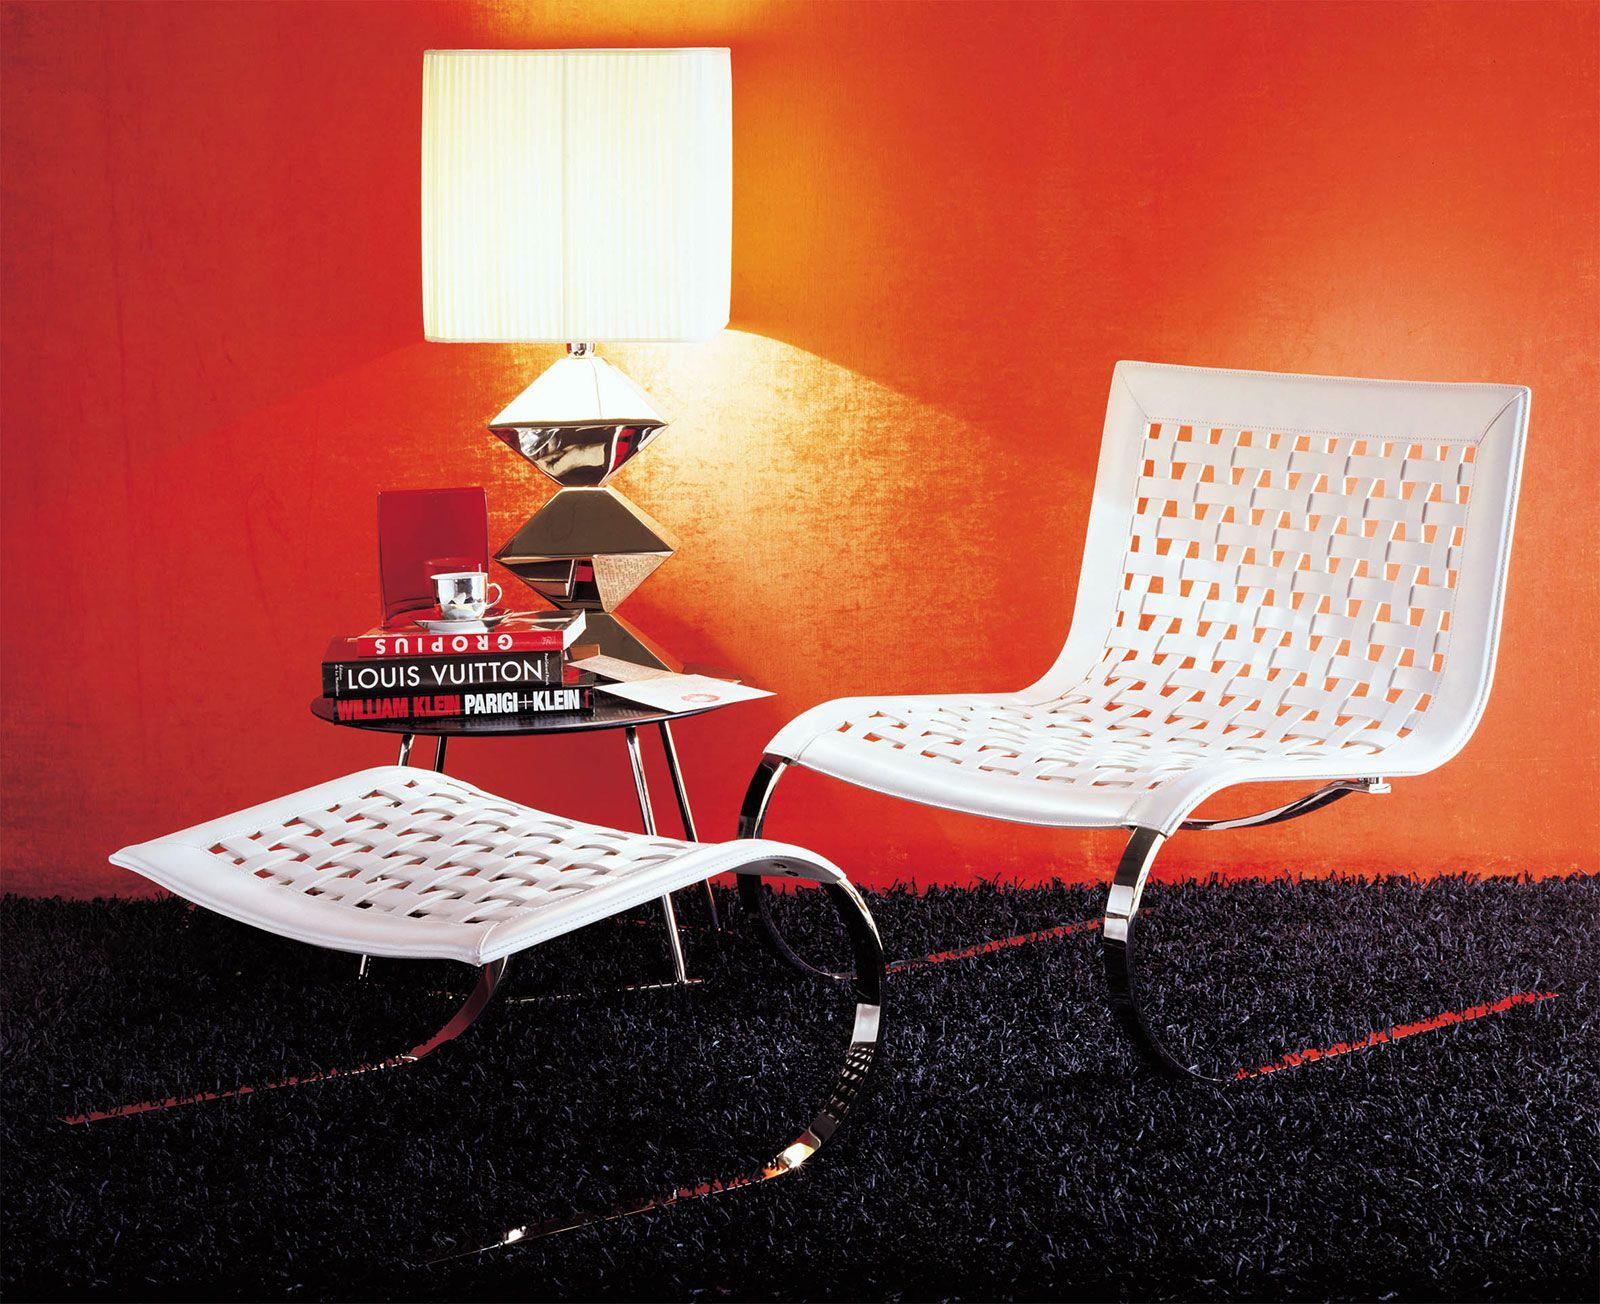 Poltrona pelle bianca rossa nera mucca poltroncina camera for Arredamento casa moderna